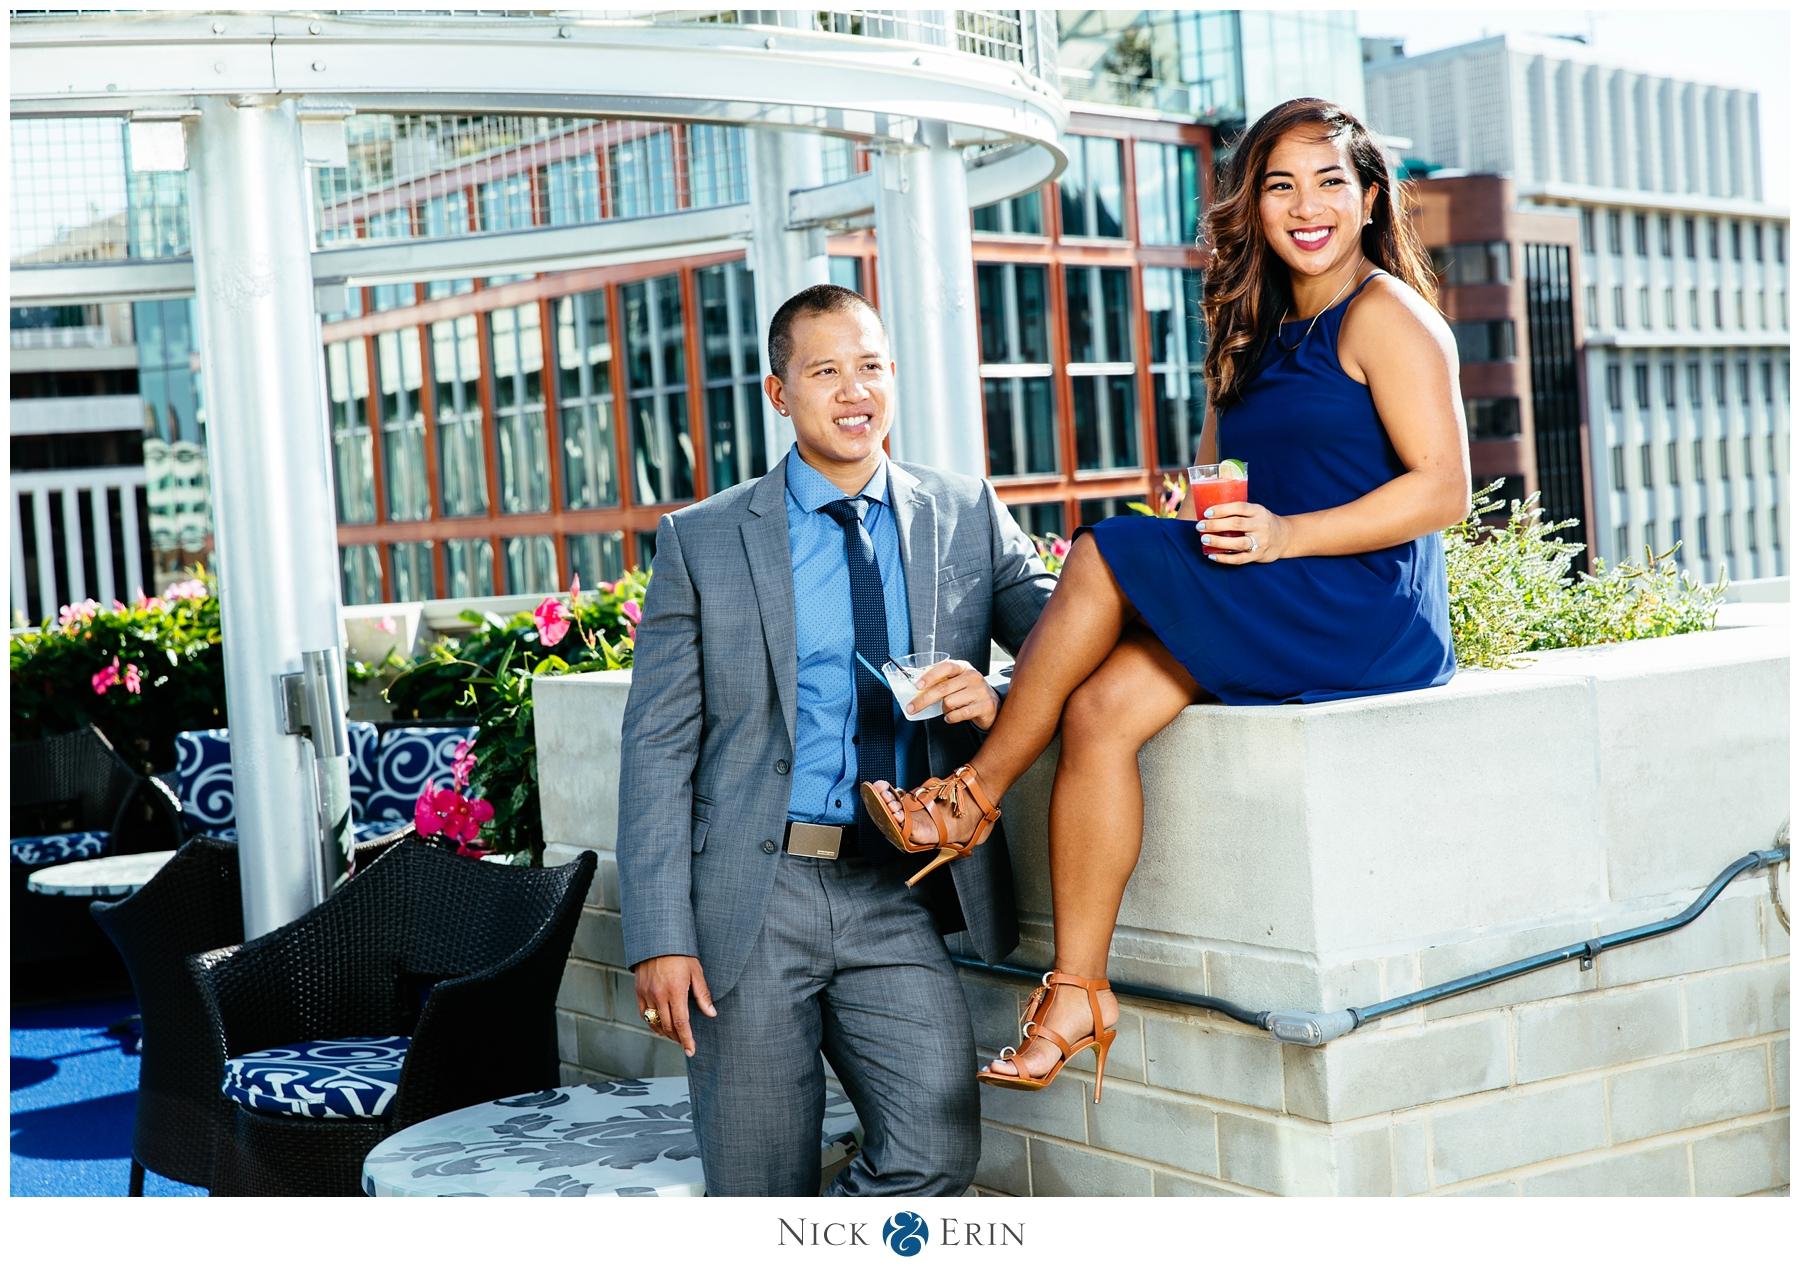 Donner_Photography_Washington DC Engagement Session_Jenny Mae & Vic_0012